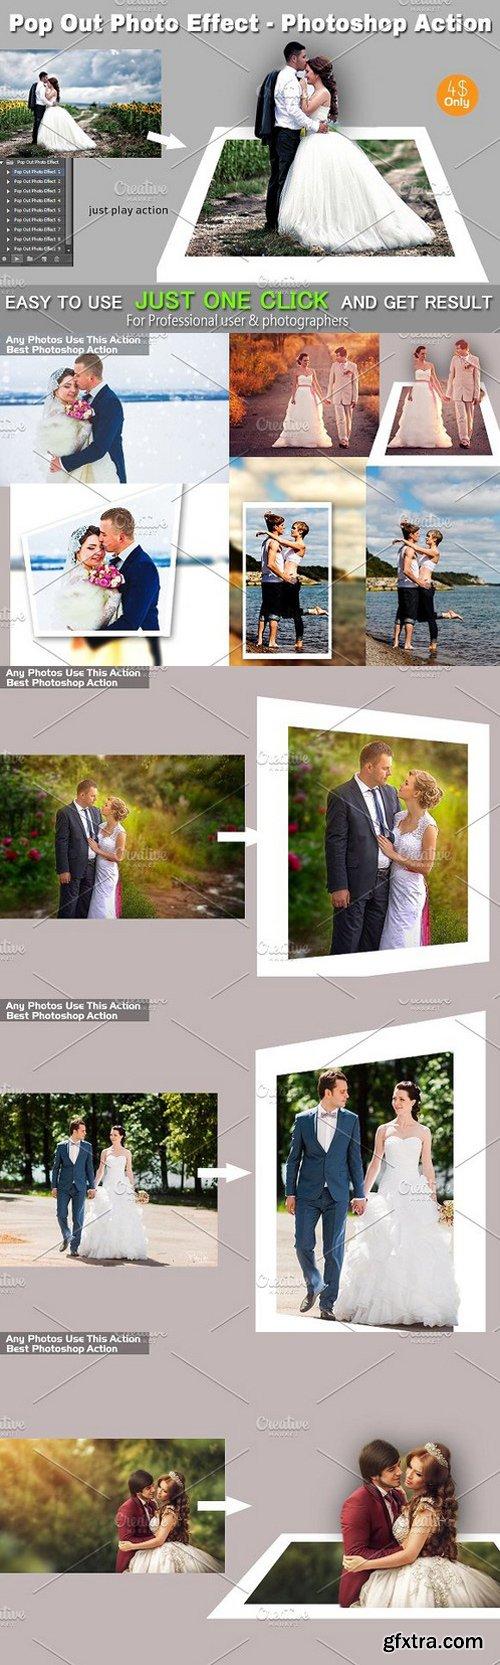 CM - Pop Out Photo Effect PS Action 1673858